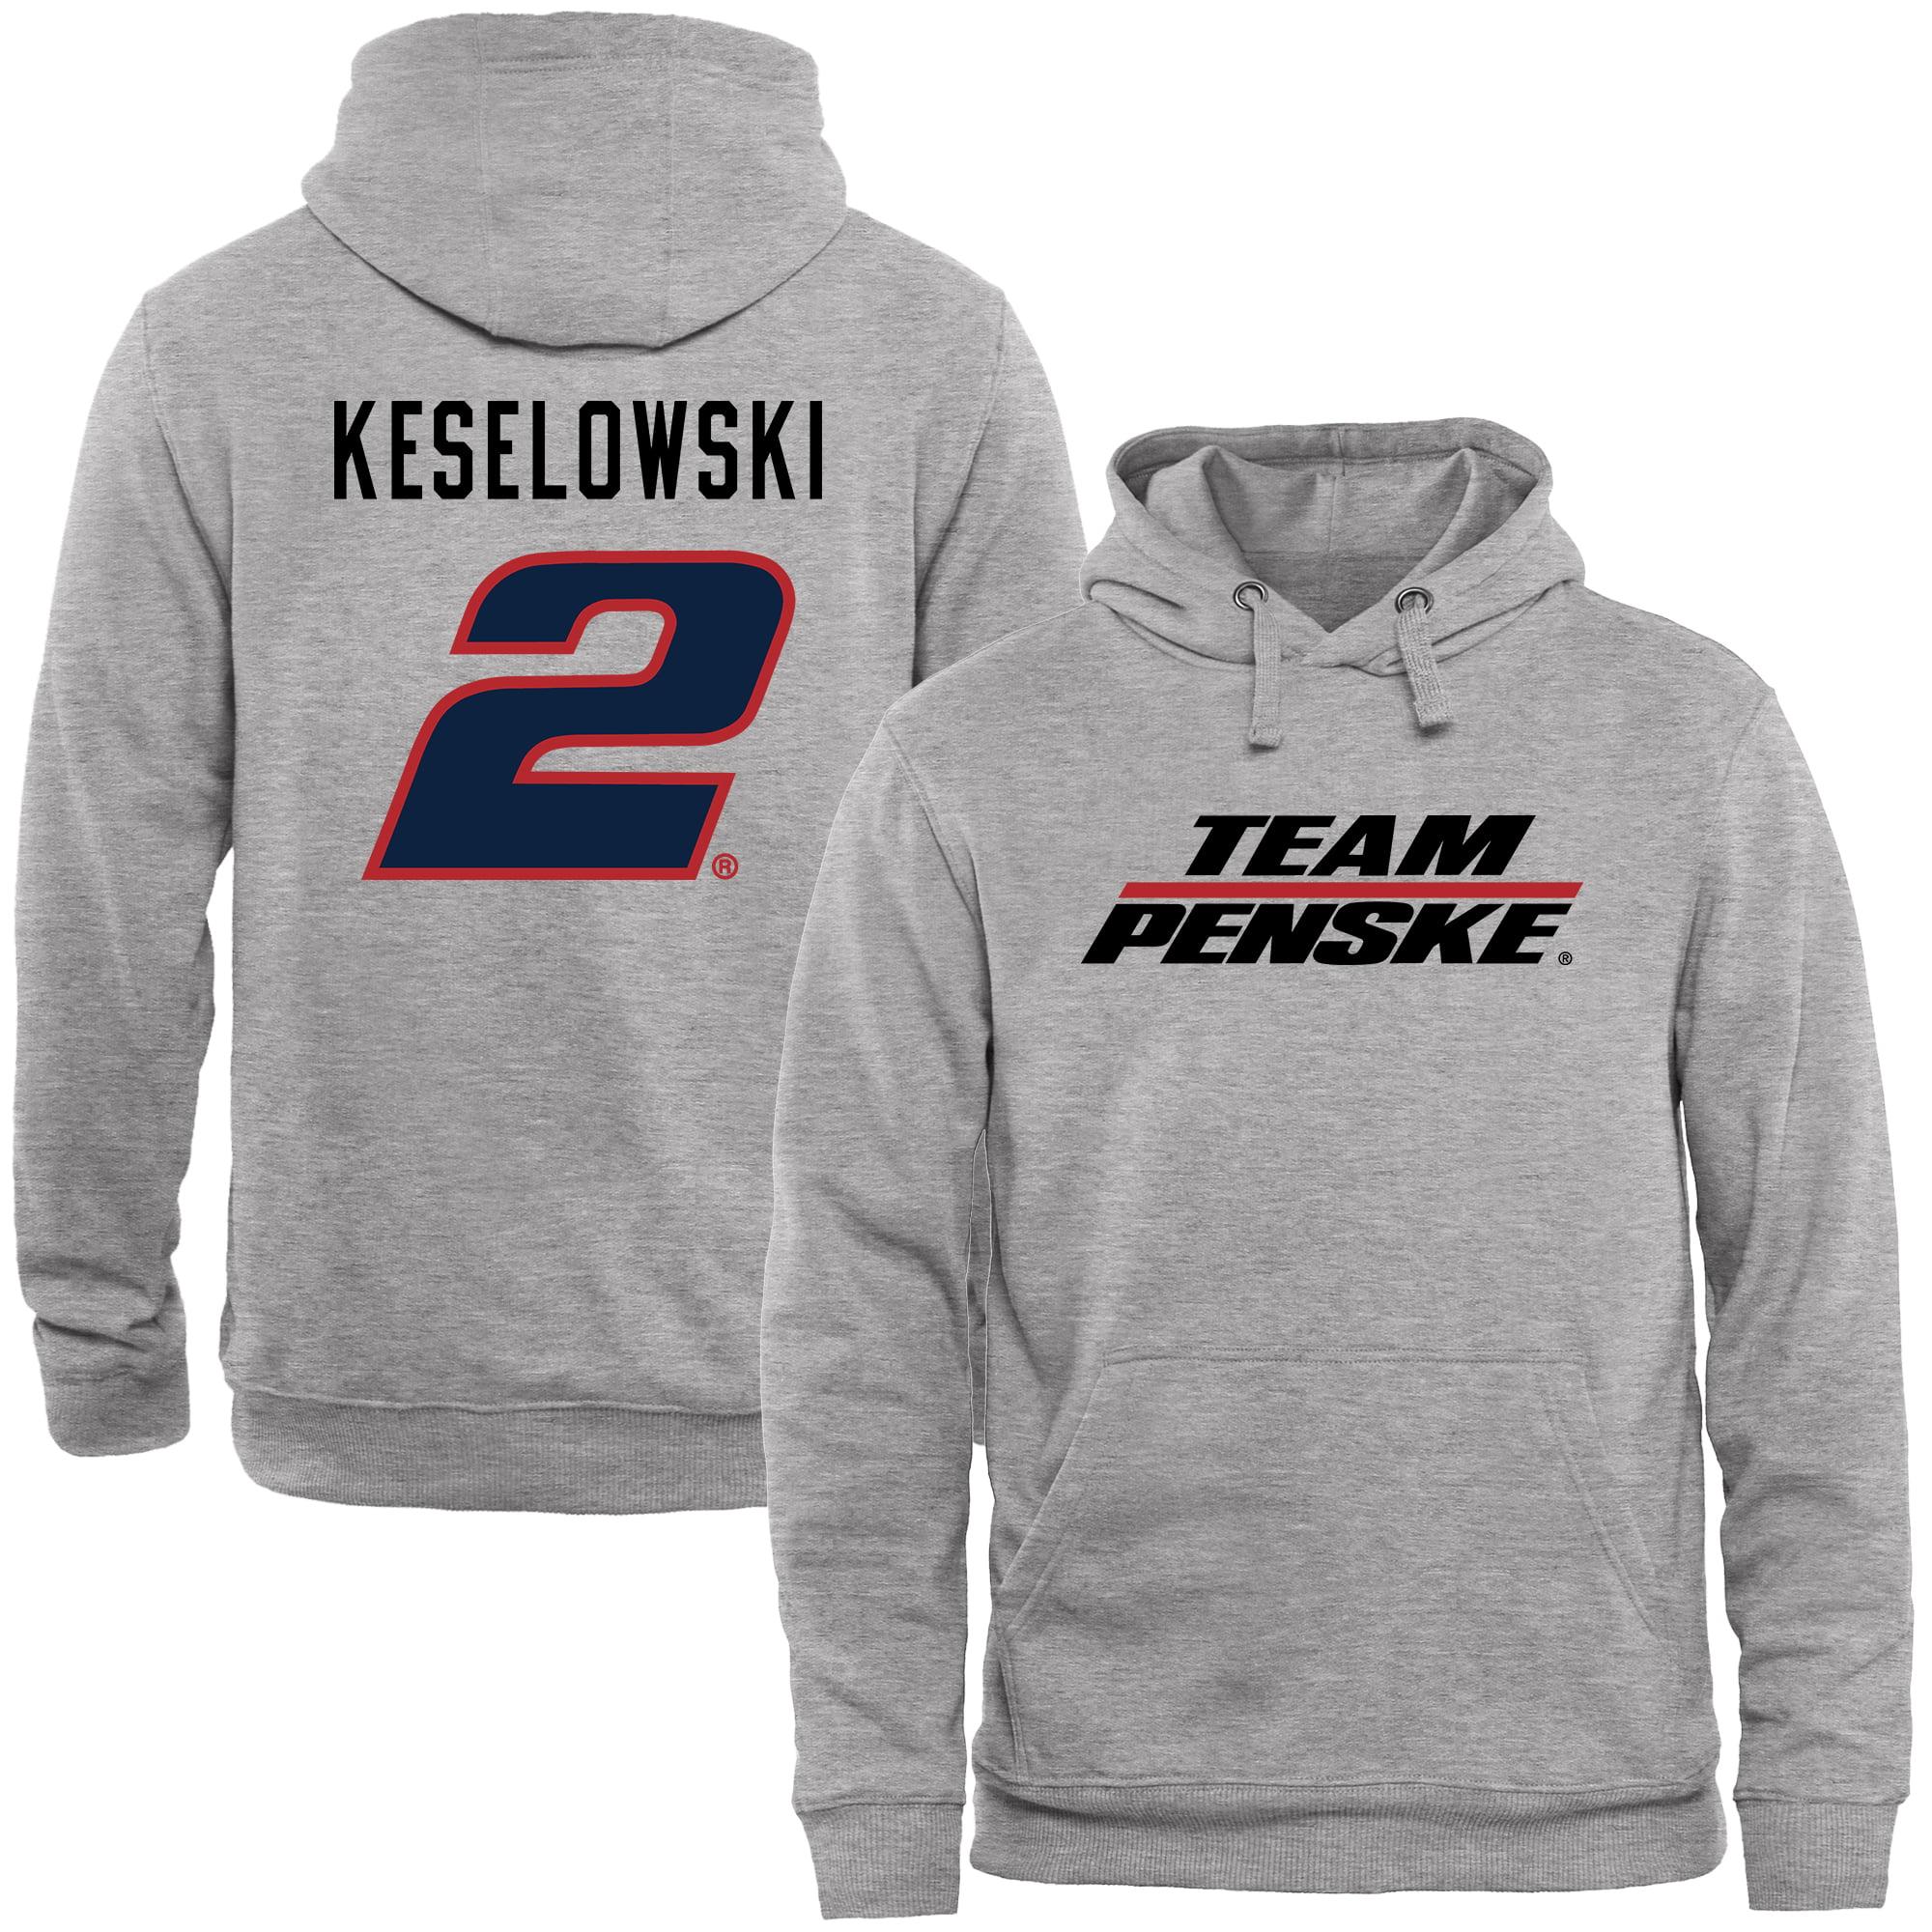 Brad Keselowski Driver Name & Number Pullover Hoodie - Ash